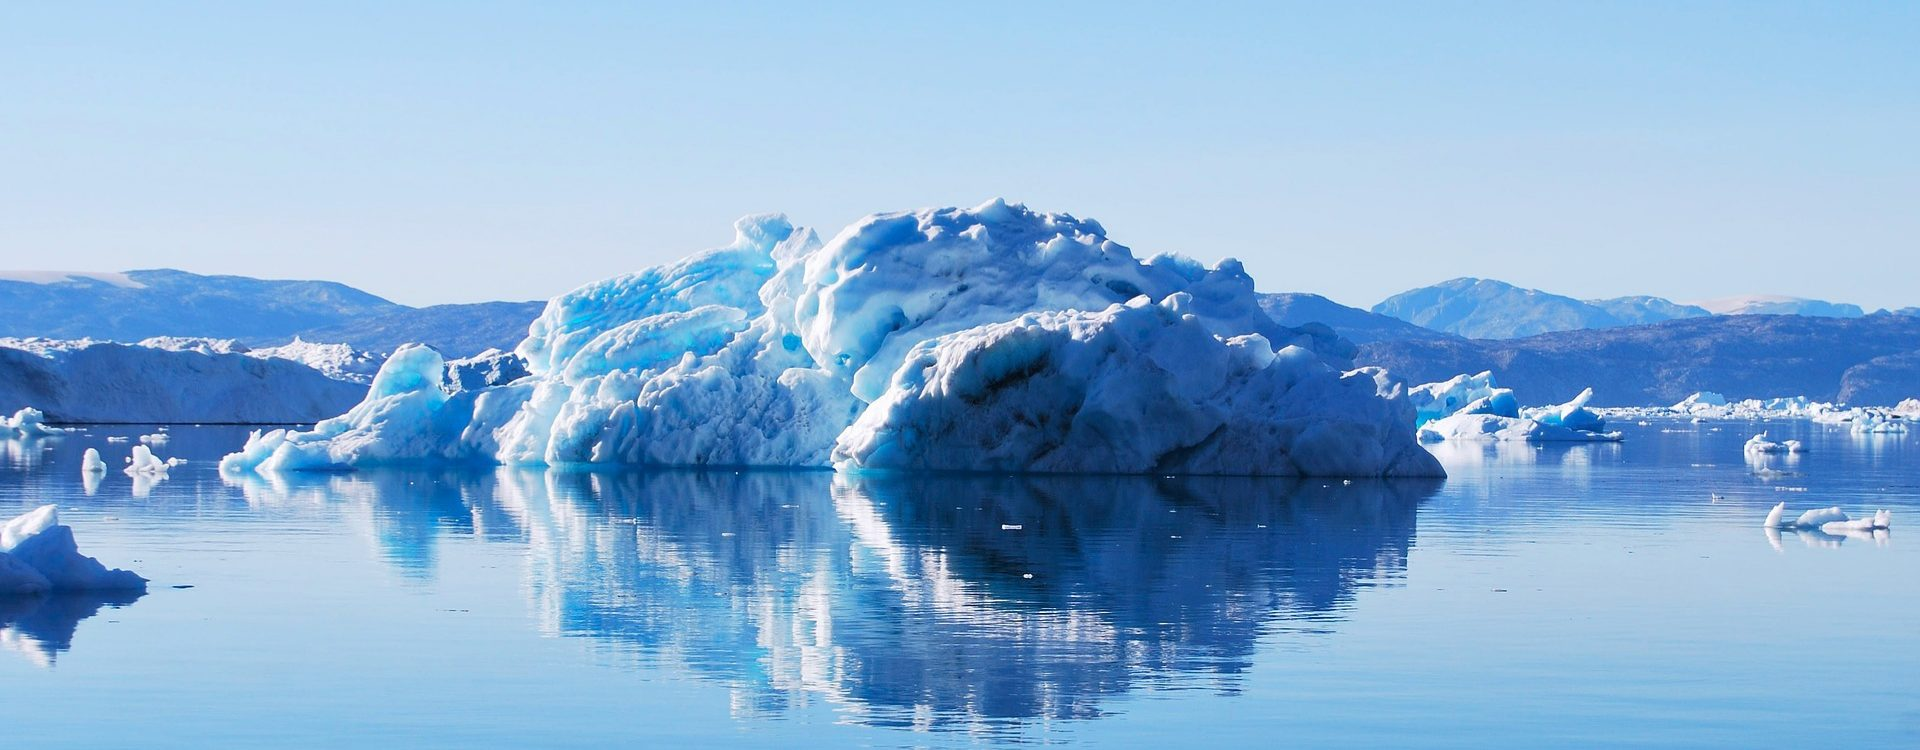 Destination : Groenland - Les matins du monde